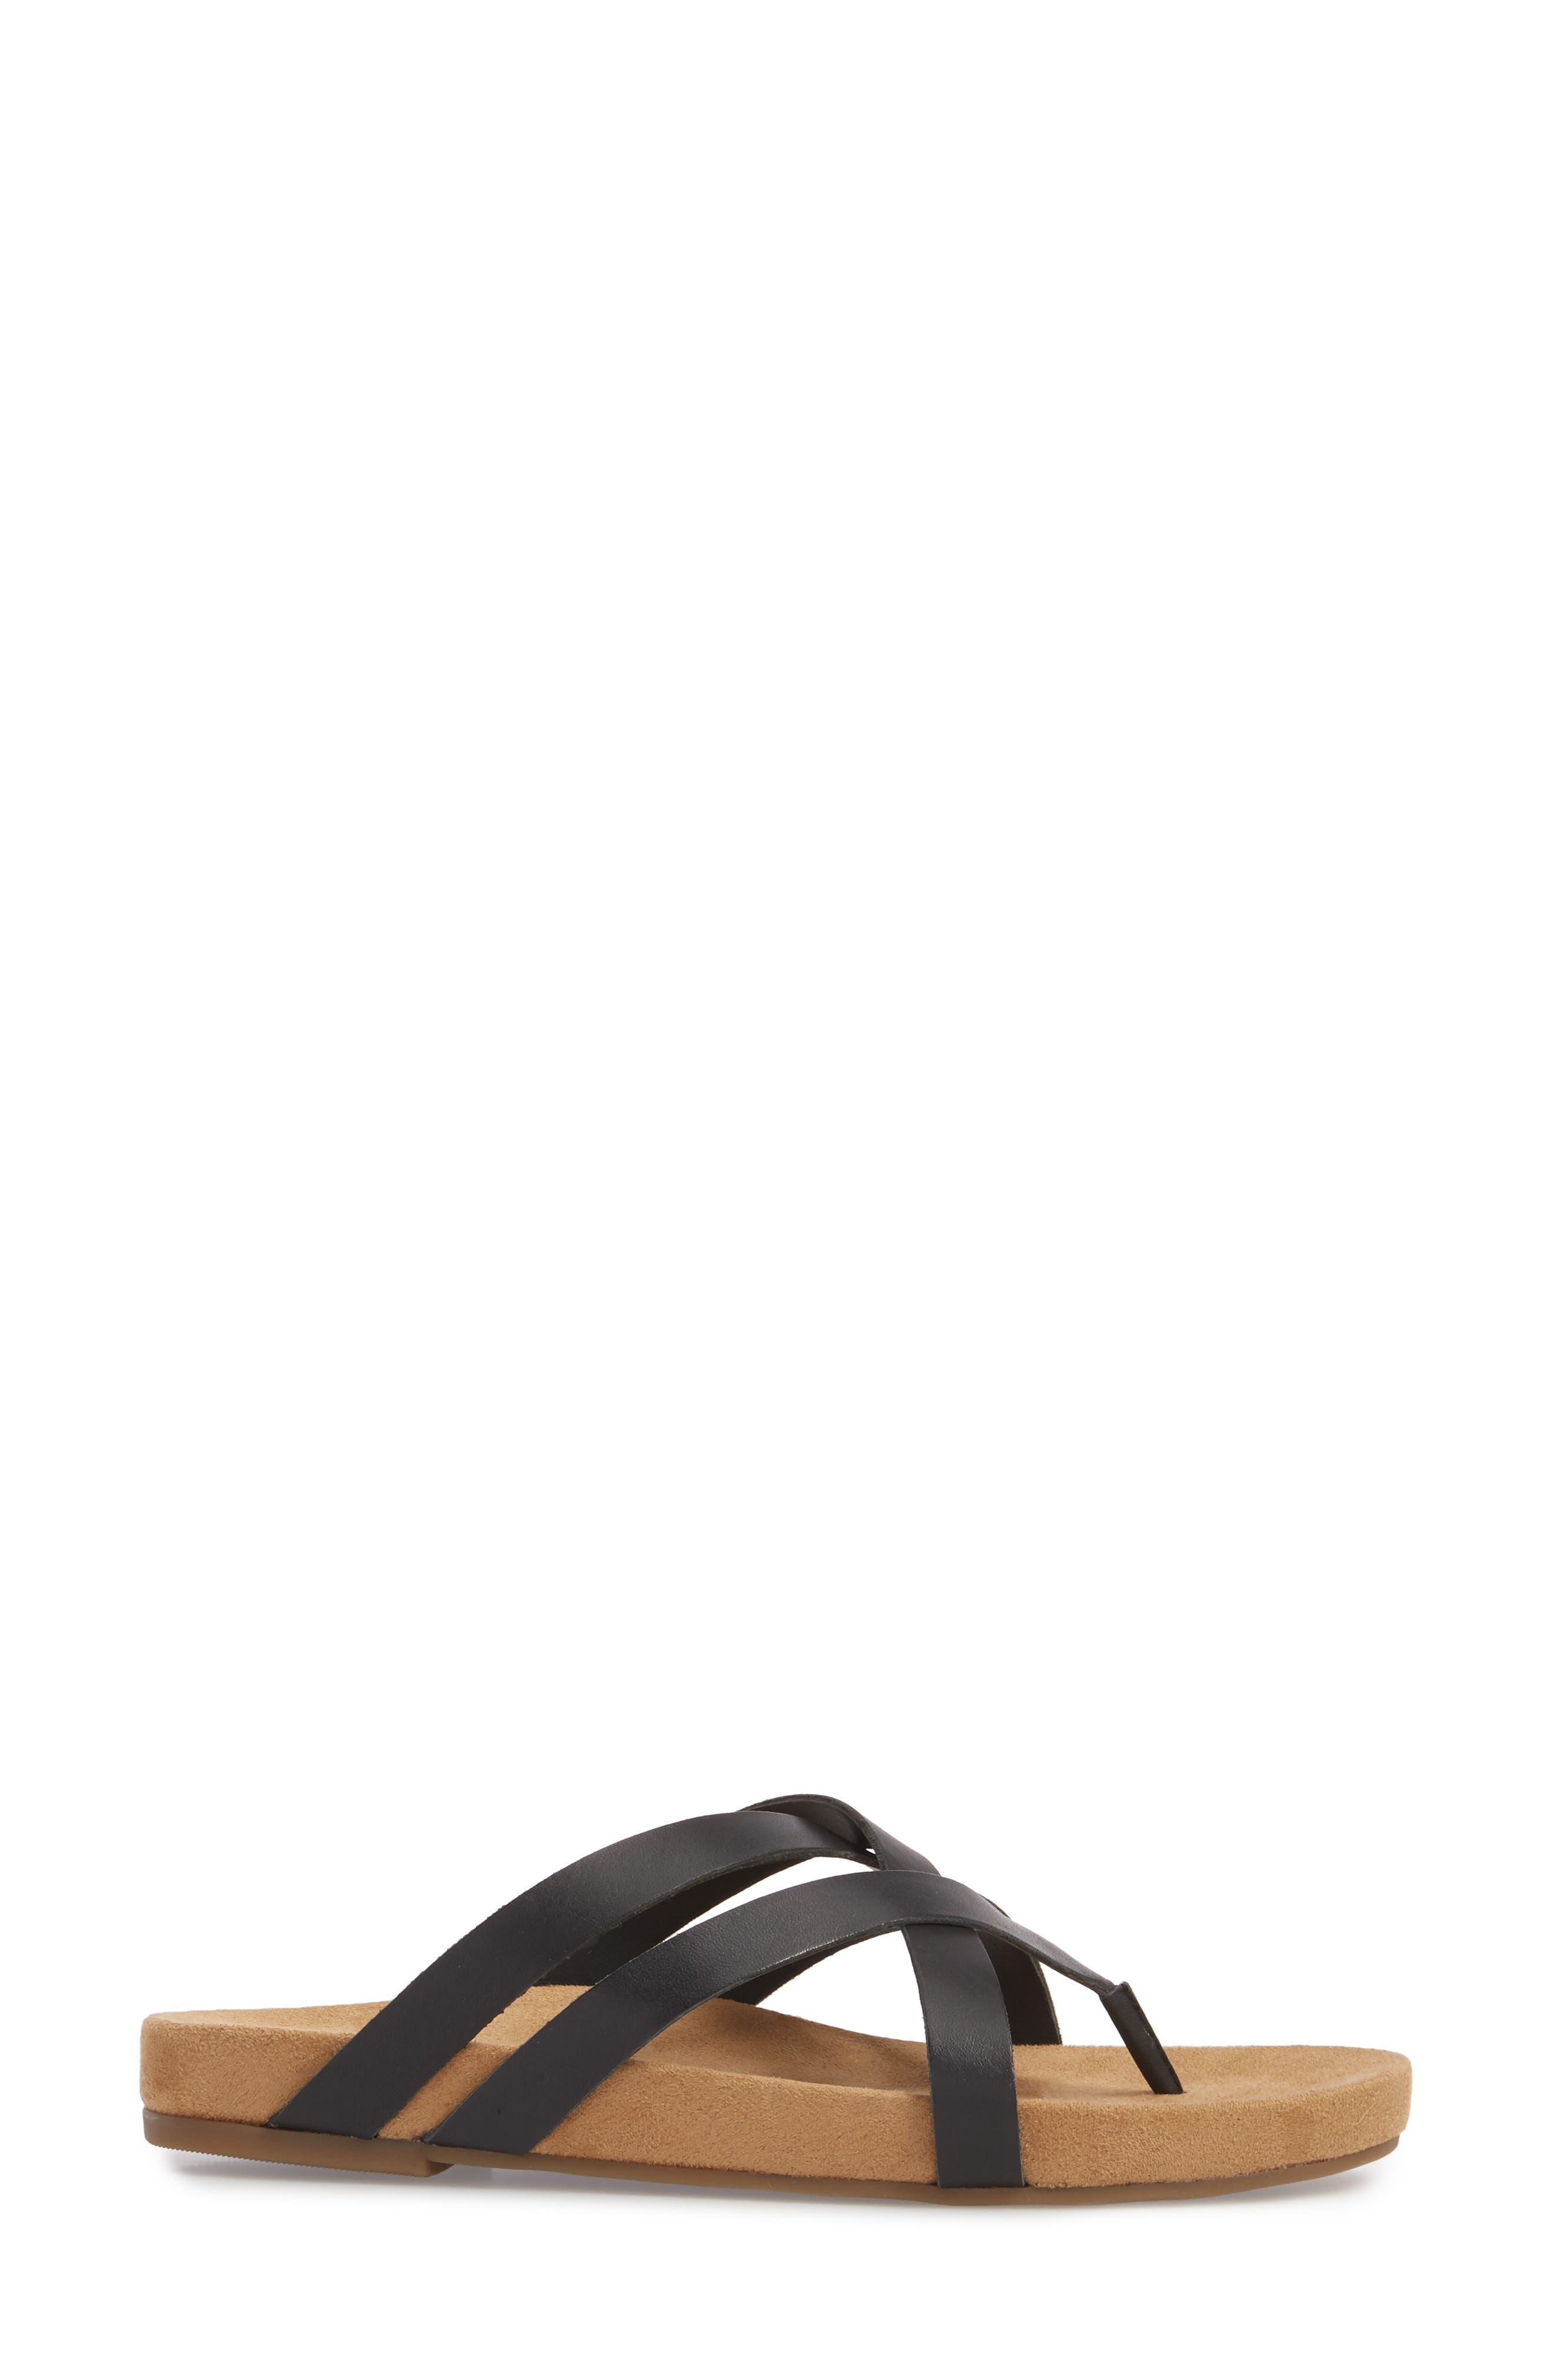 Fillima Flip Flop,                             Alternate thumbnail 3, color,                             Black Leather